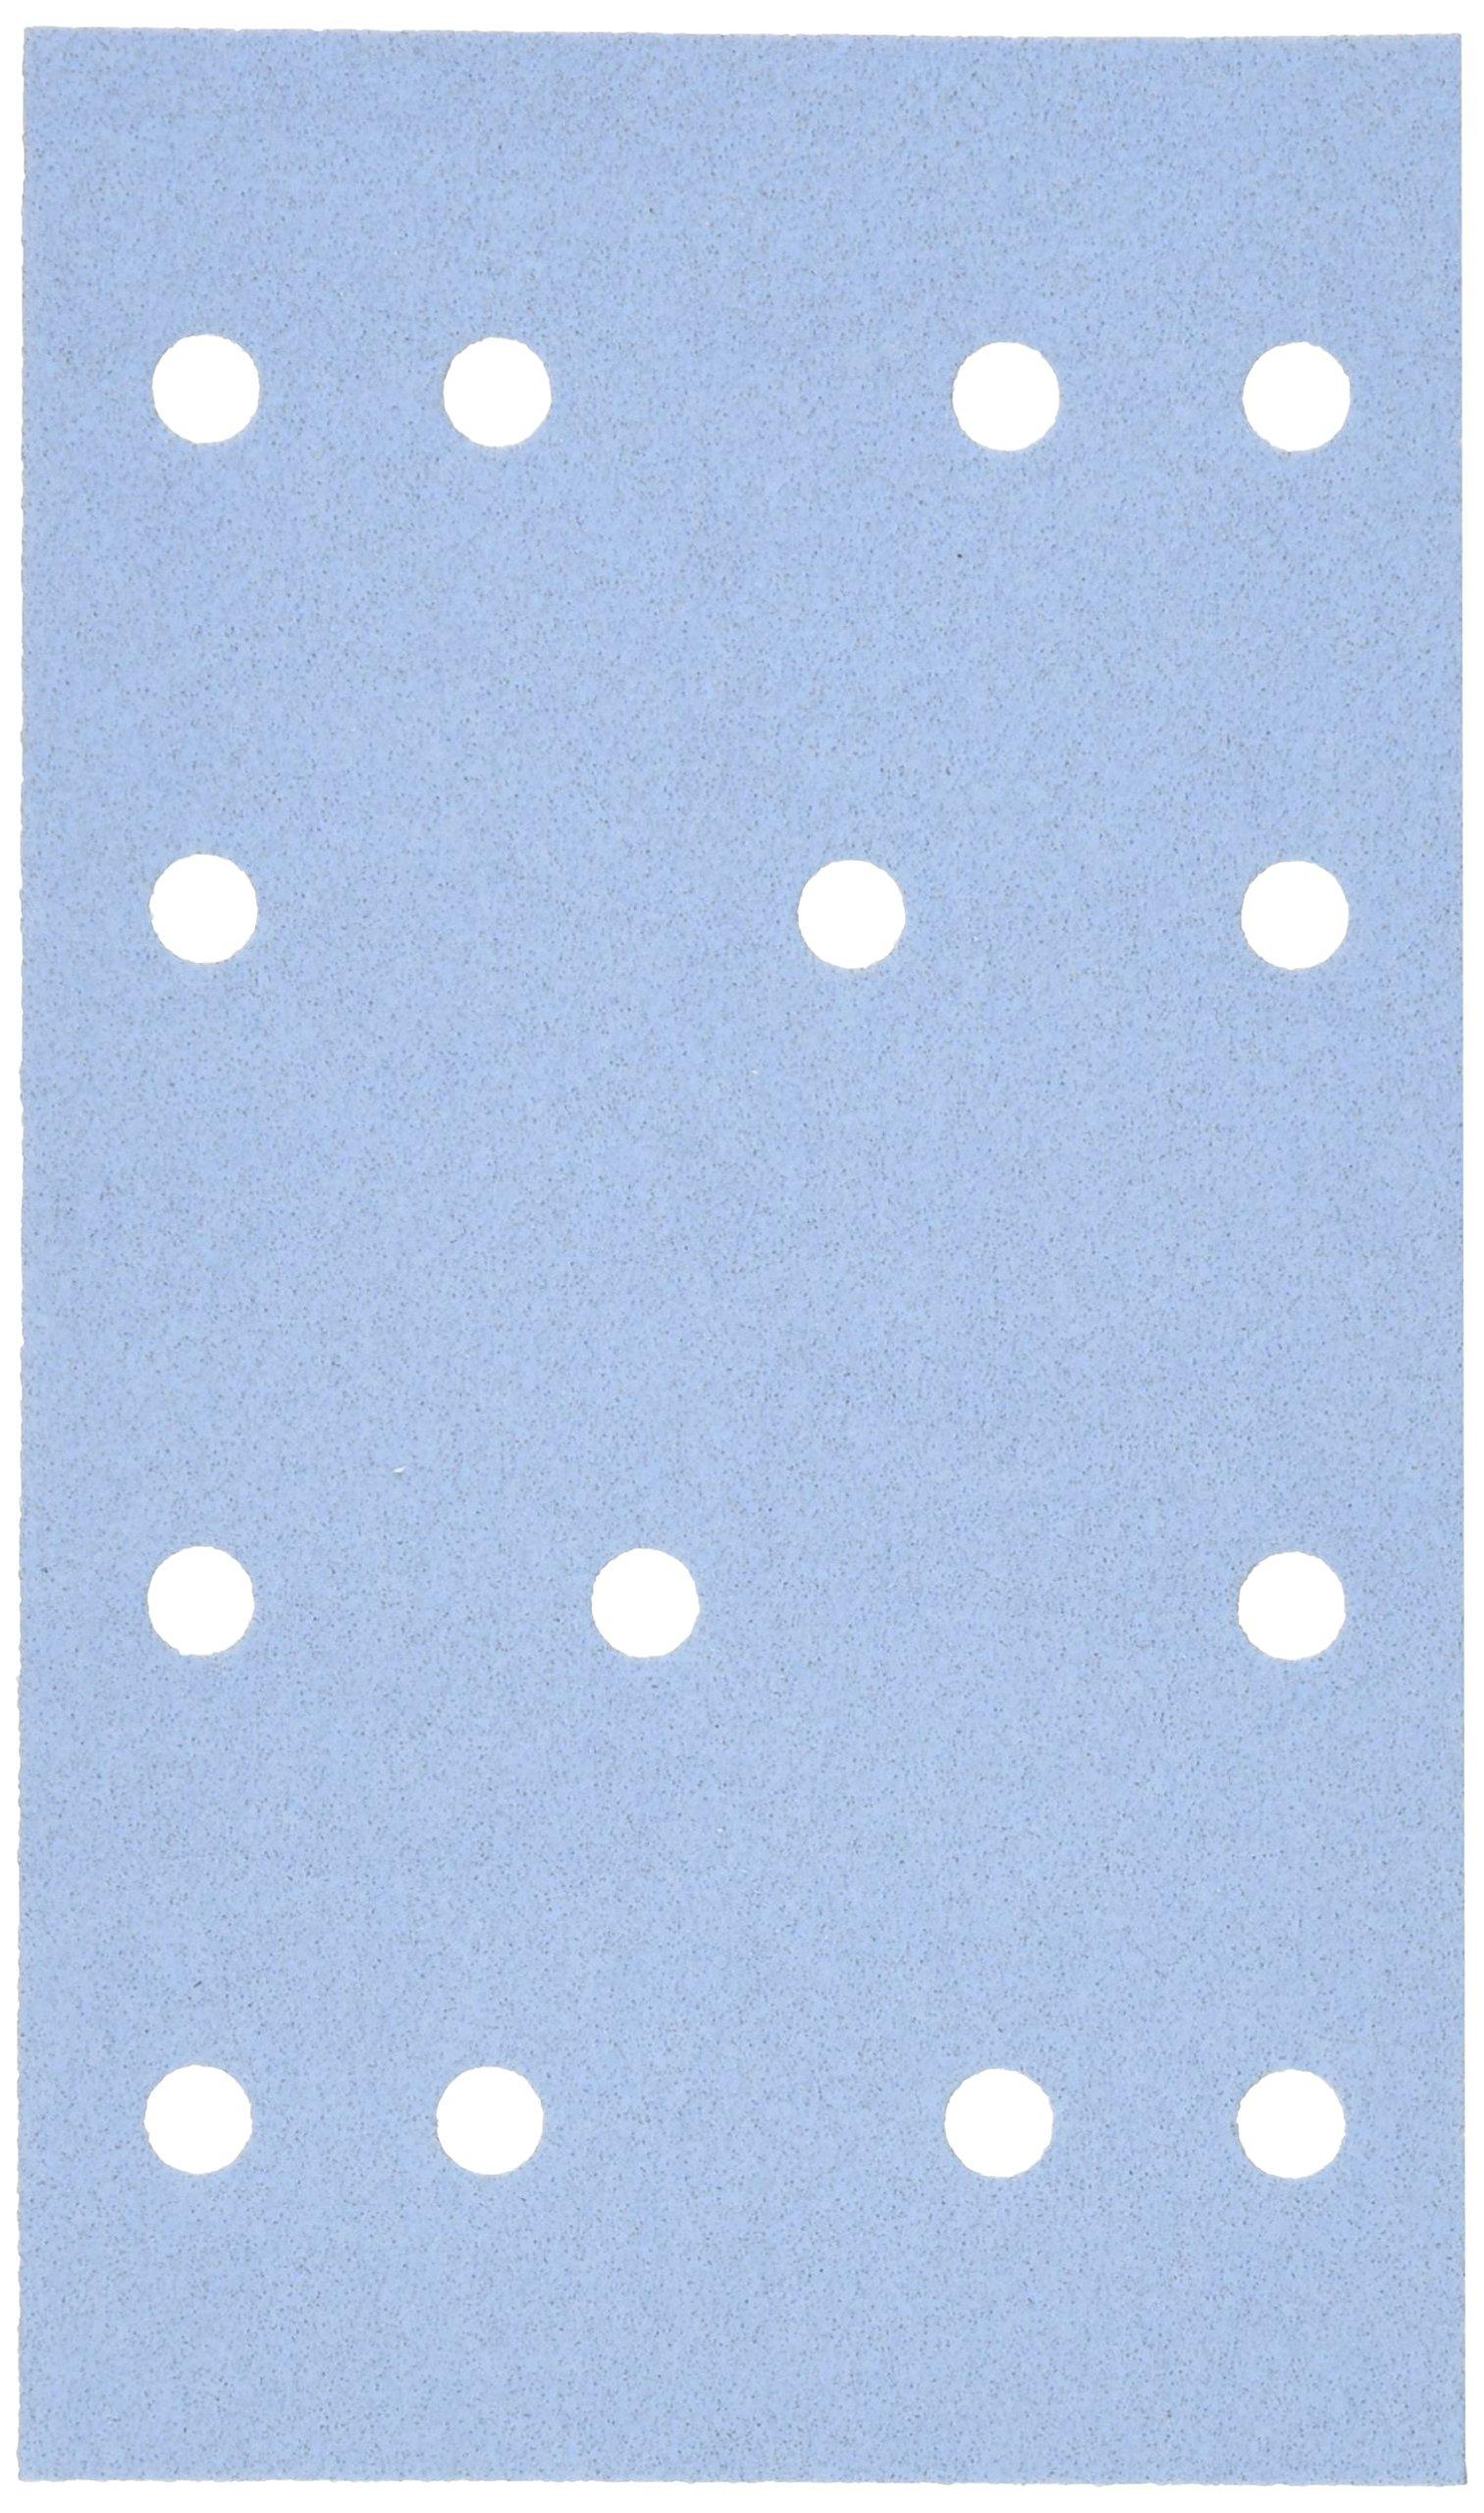 Festool 497120 P120 Grit, Granat Abrasives, Pack of 100 by Festool